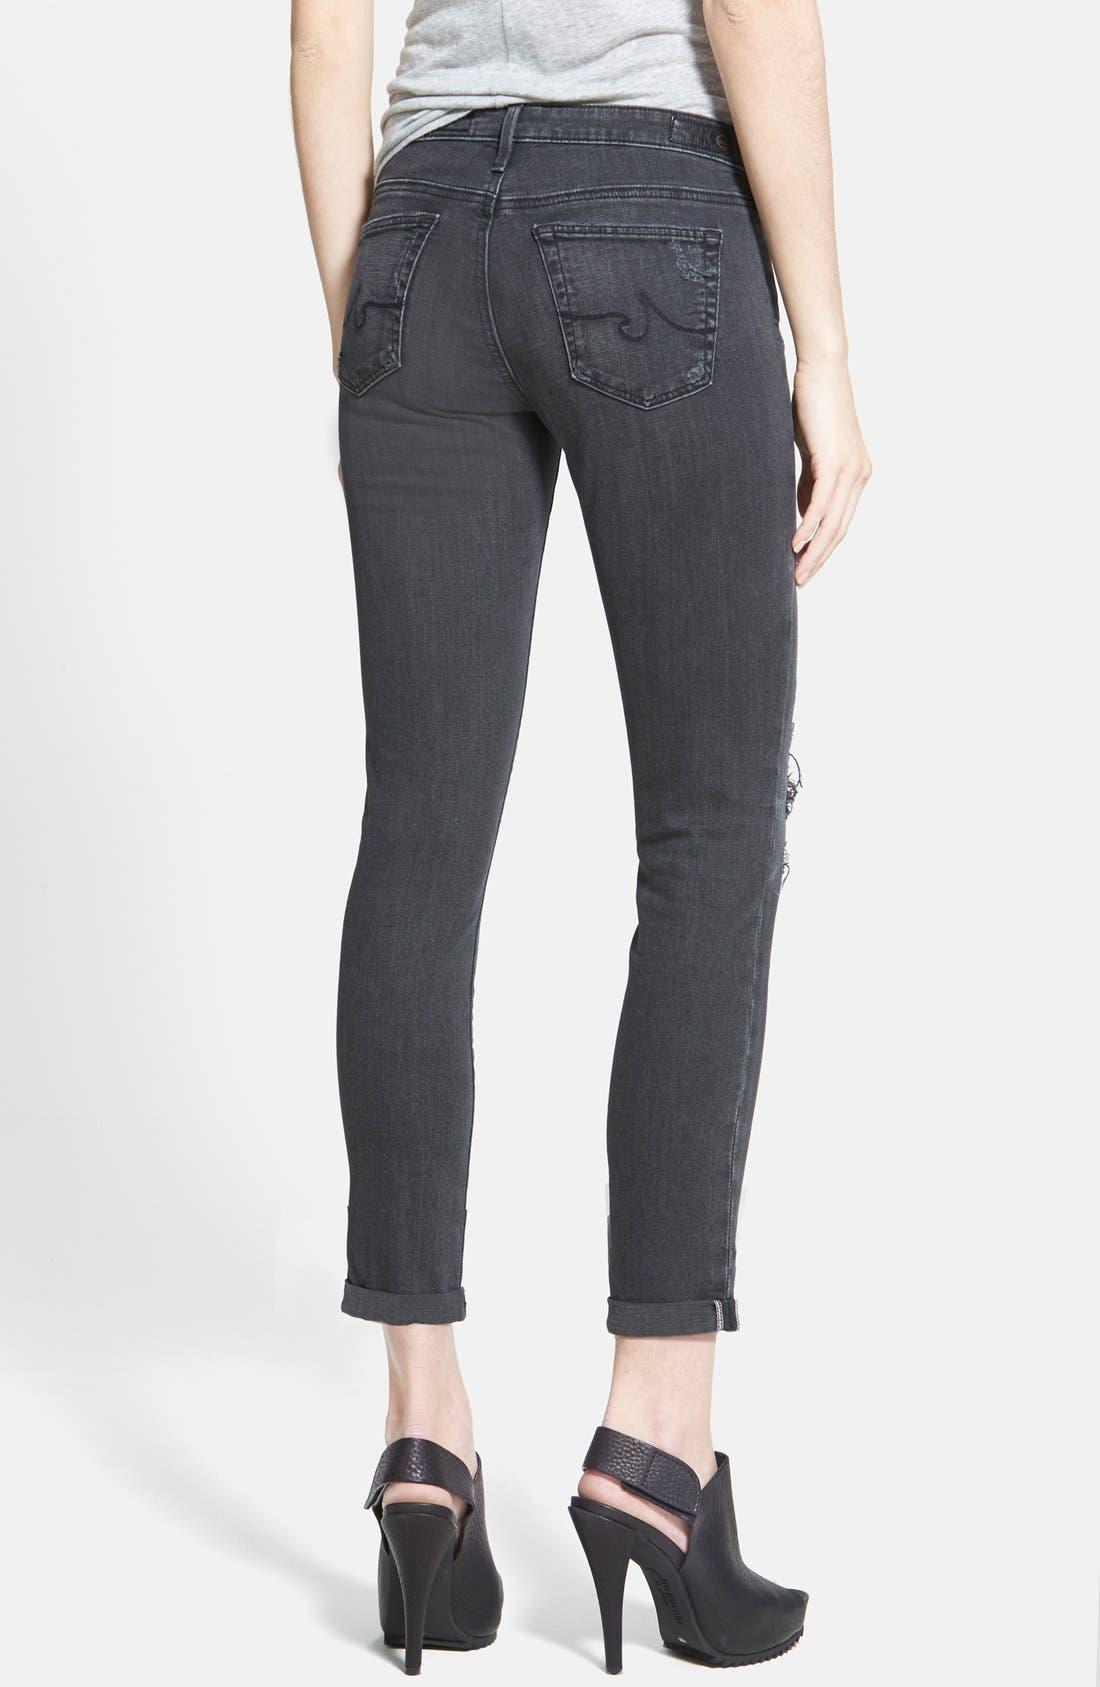 Alternate Image 2  - AG 'The Stilt' Cuffed Cigarette Jeans (Mantra Mended)